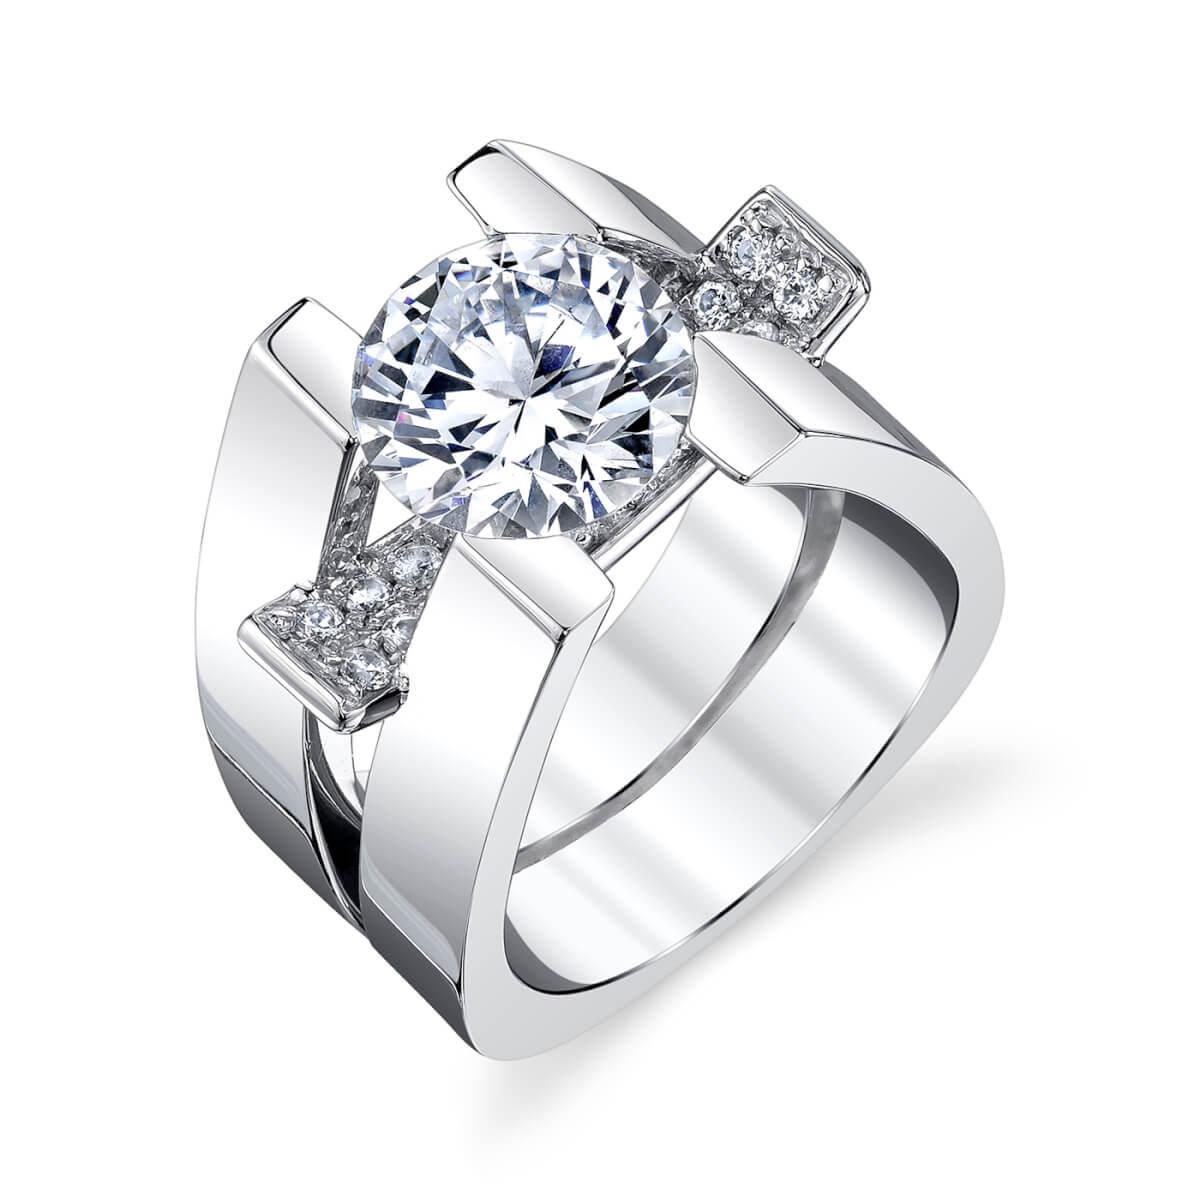 Jewelry Store Unique Engagement Wedding Rings Diamond